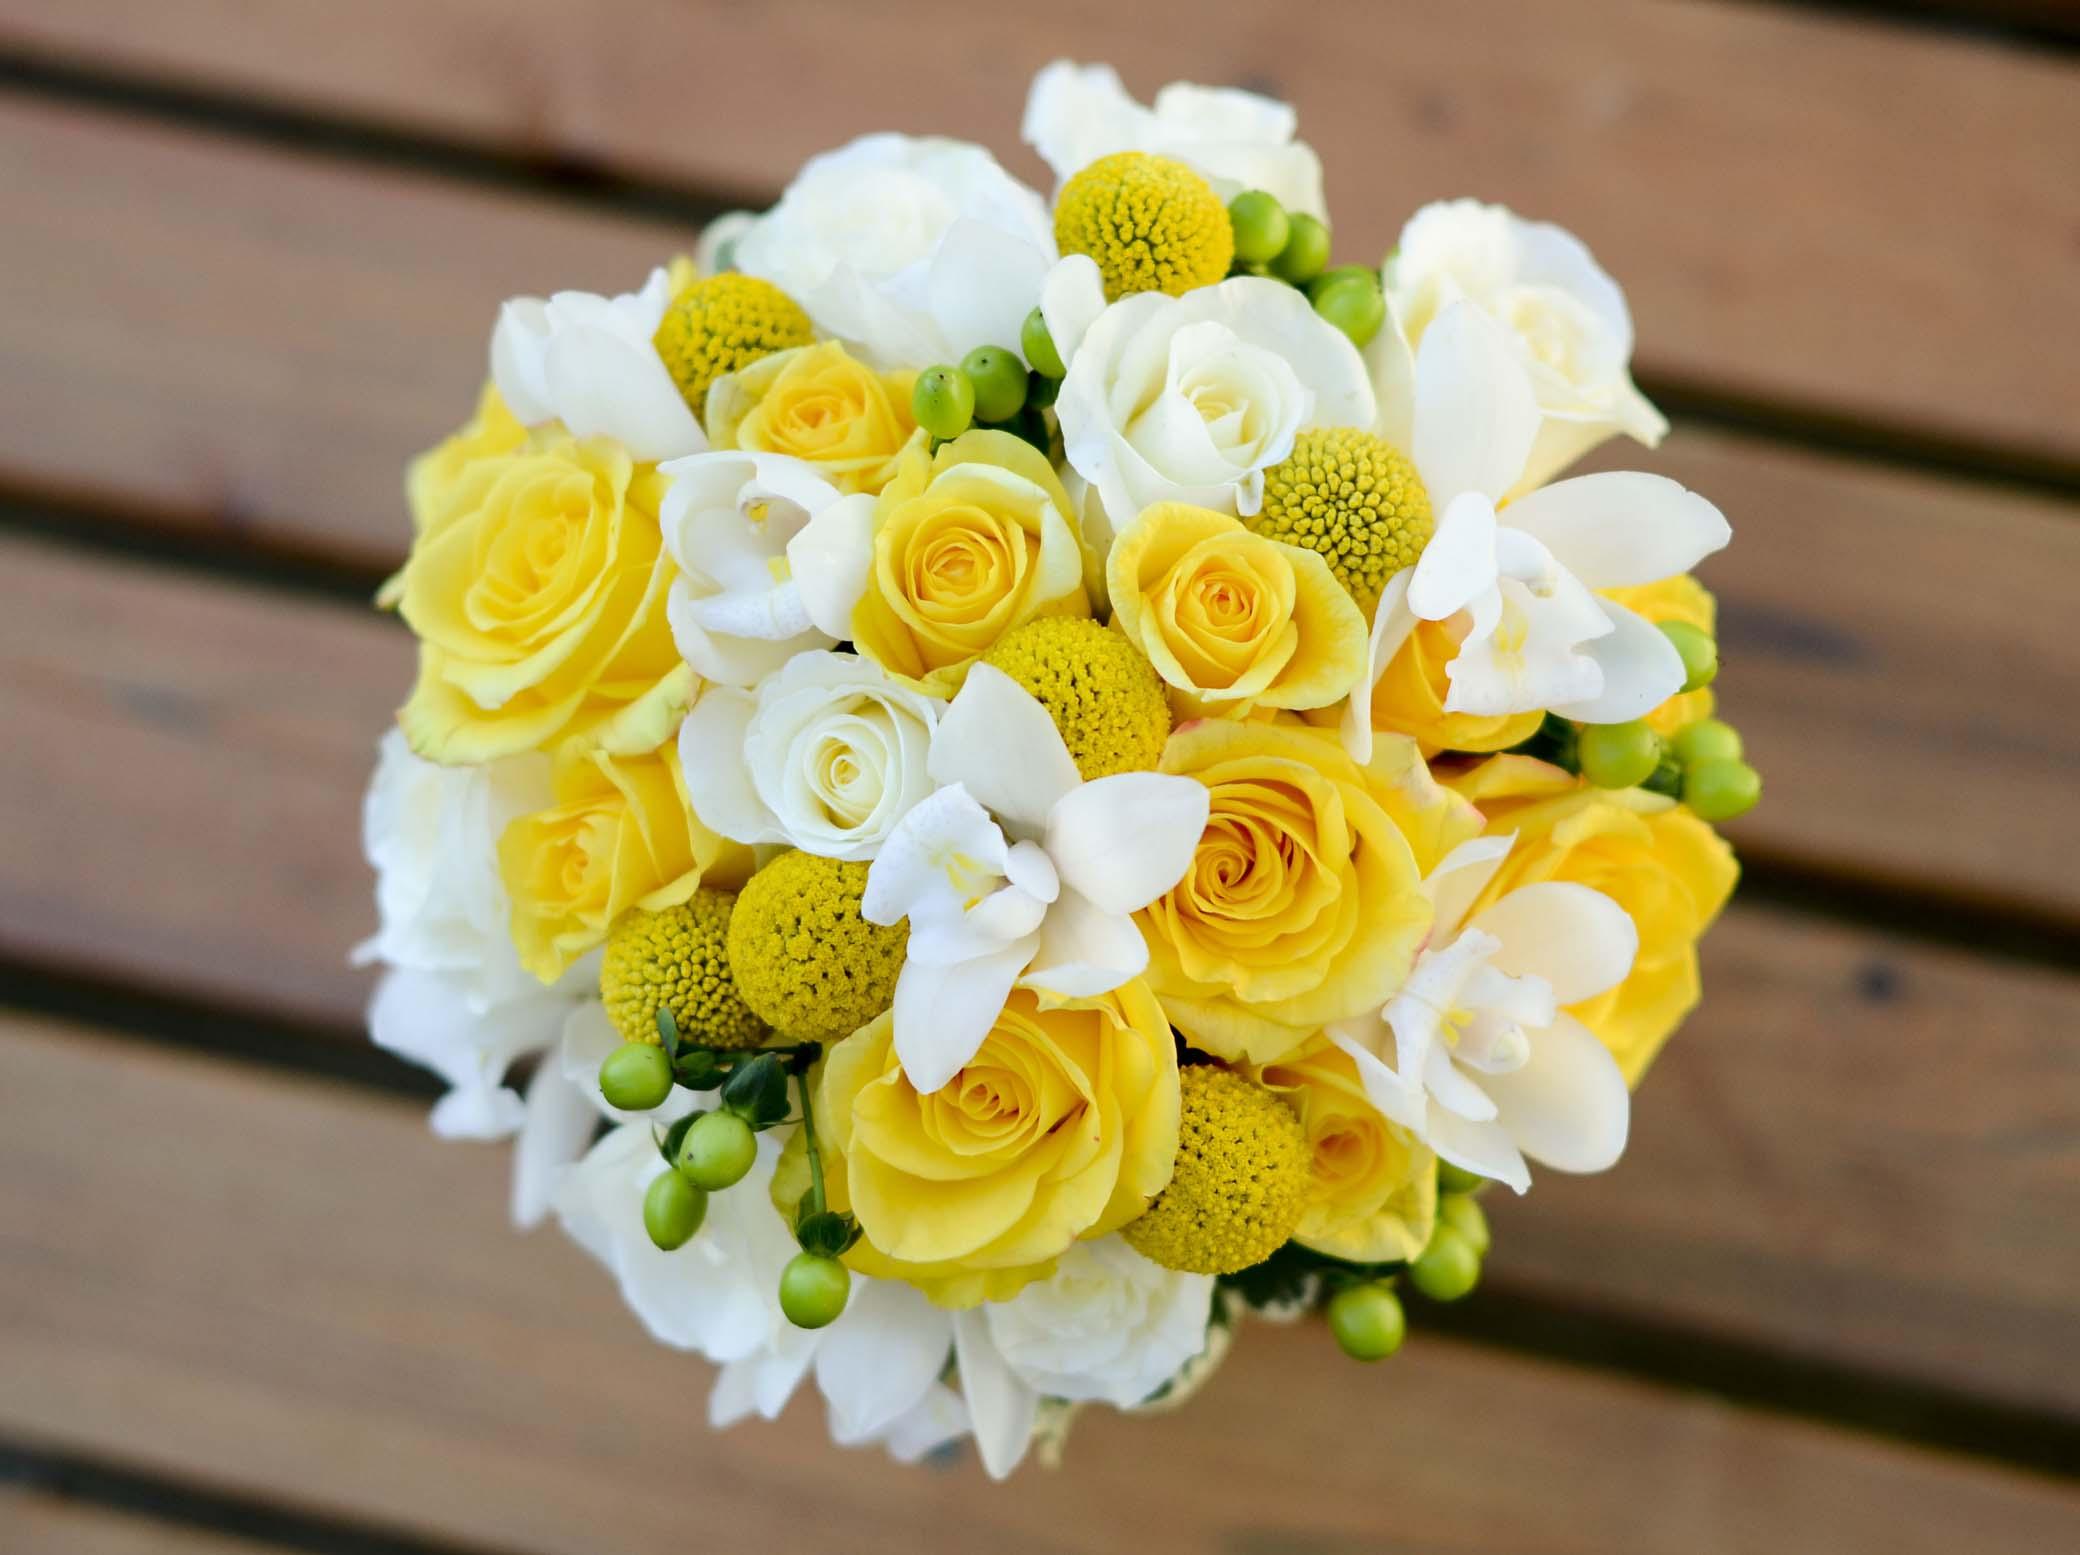 Weddings Murtons Florist Ipswich